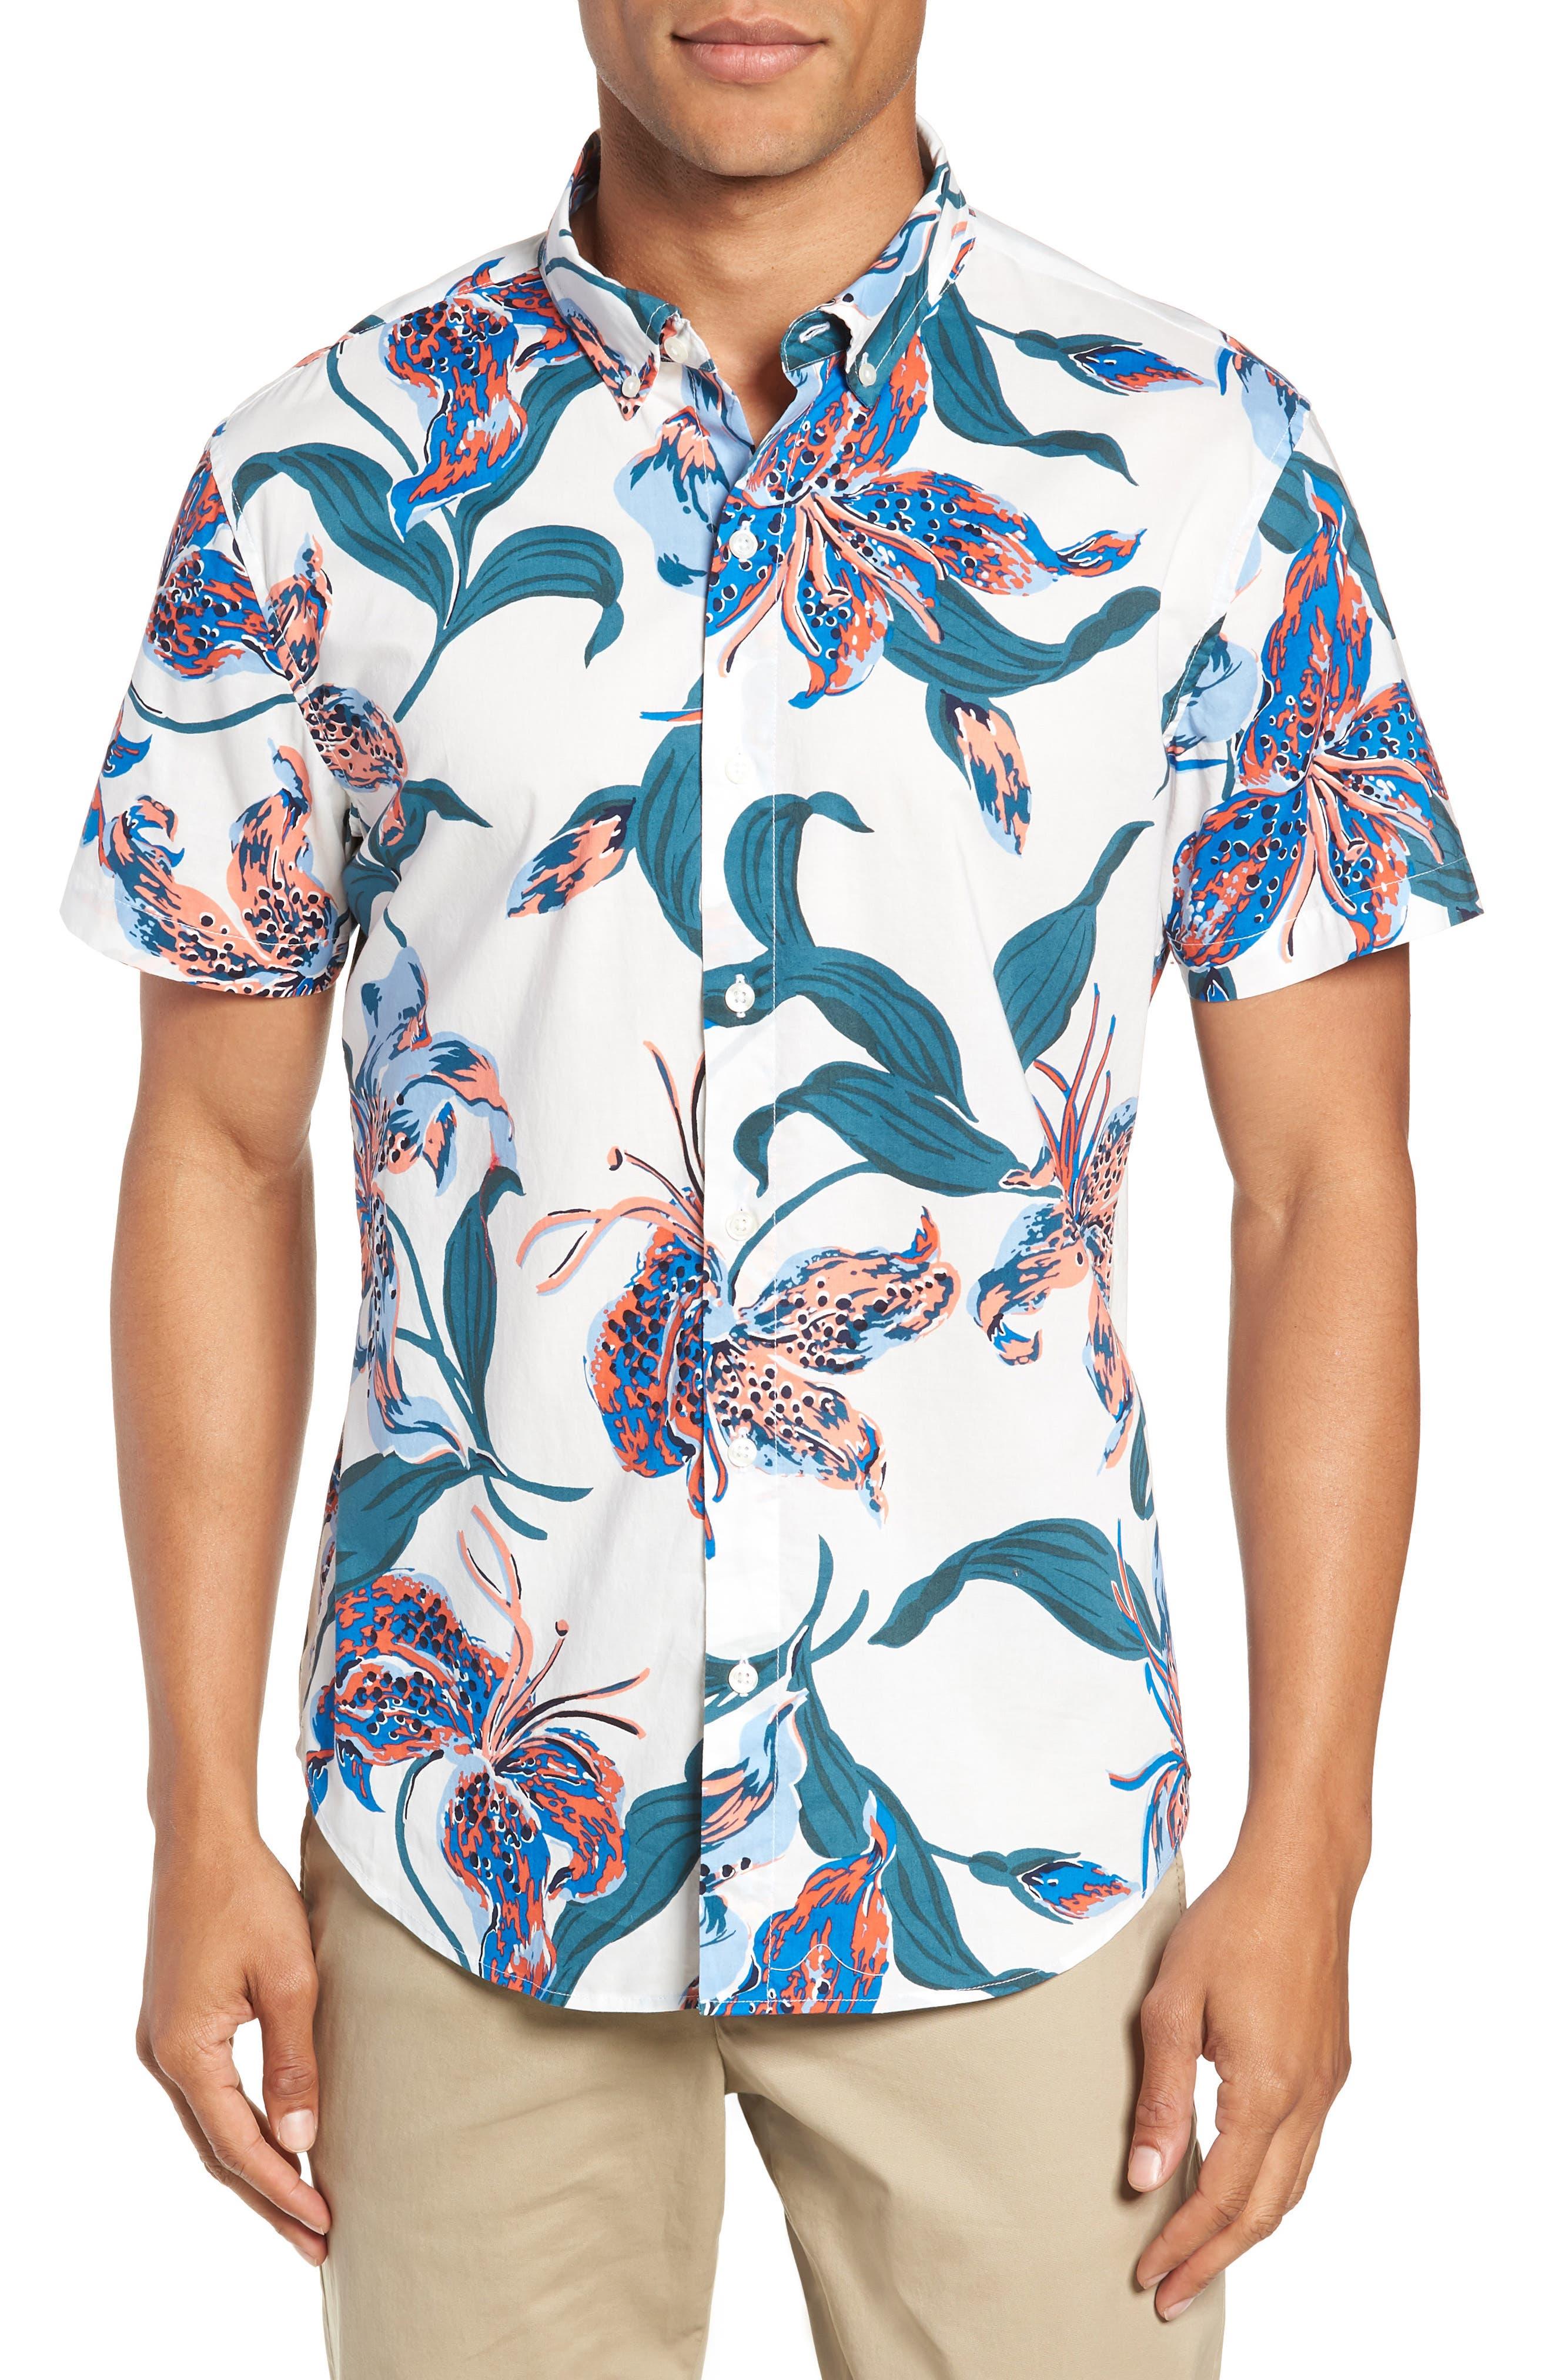 Riviera Slim Fit Floral Sport Shirt,                             Main thumbnail 1, color,                             BRIGHTON FLORAL - BLUE LEGACY